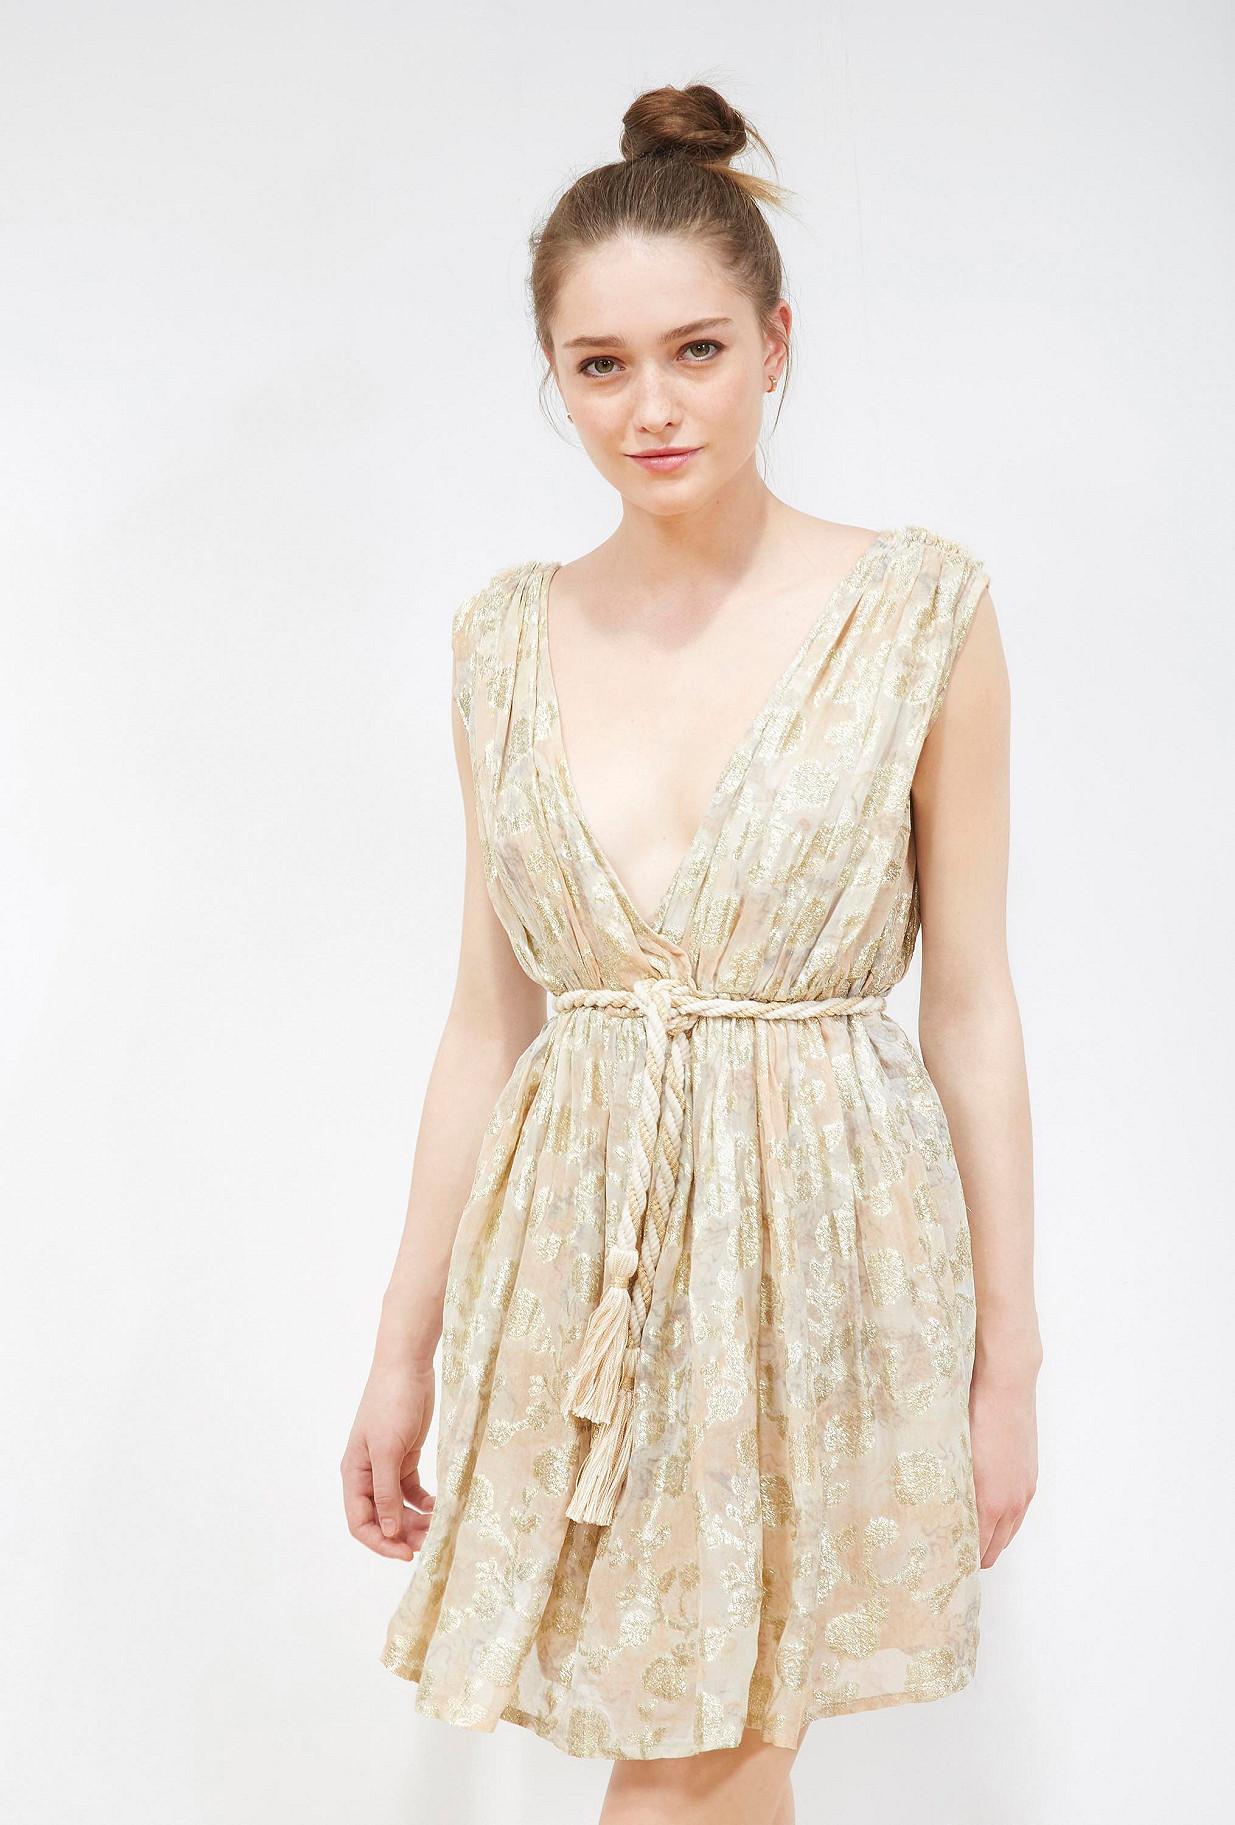 Powder  DRESS  Antigone Mes demoiselles fashion clothes designer Paris